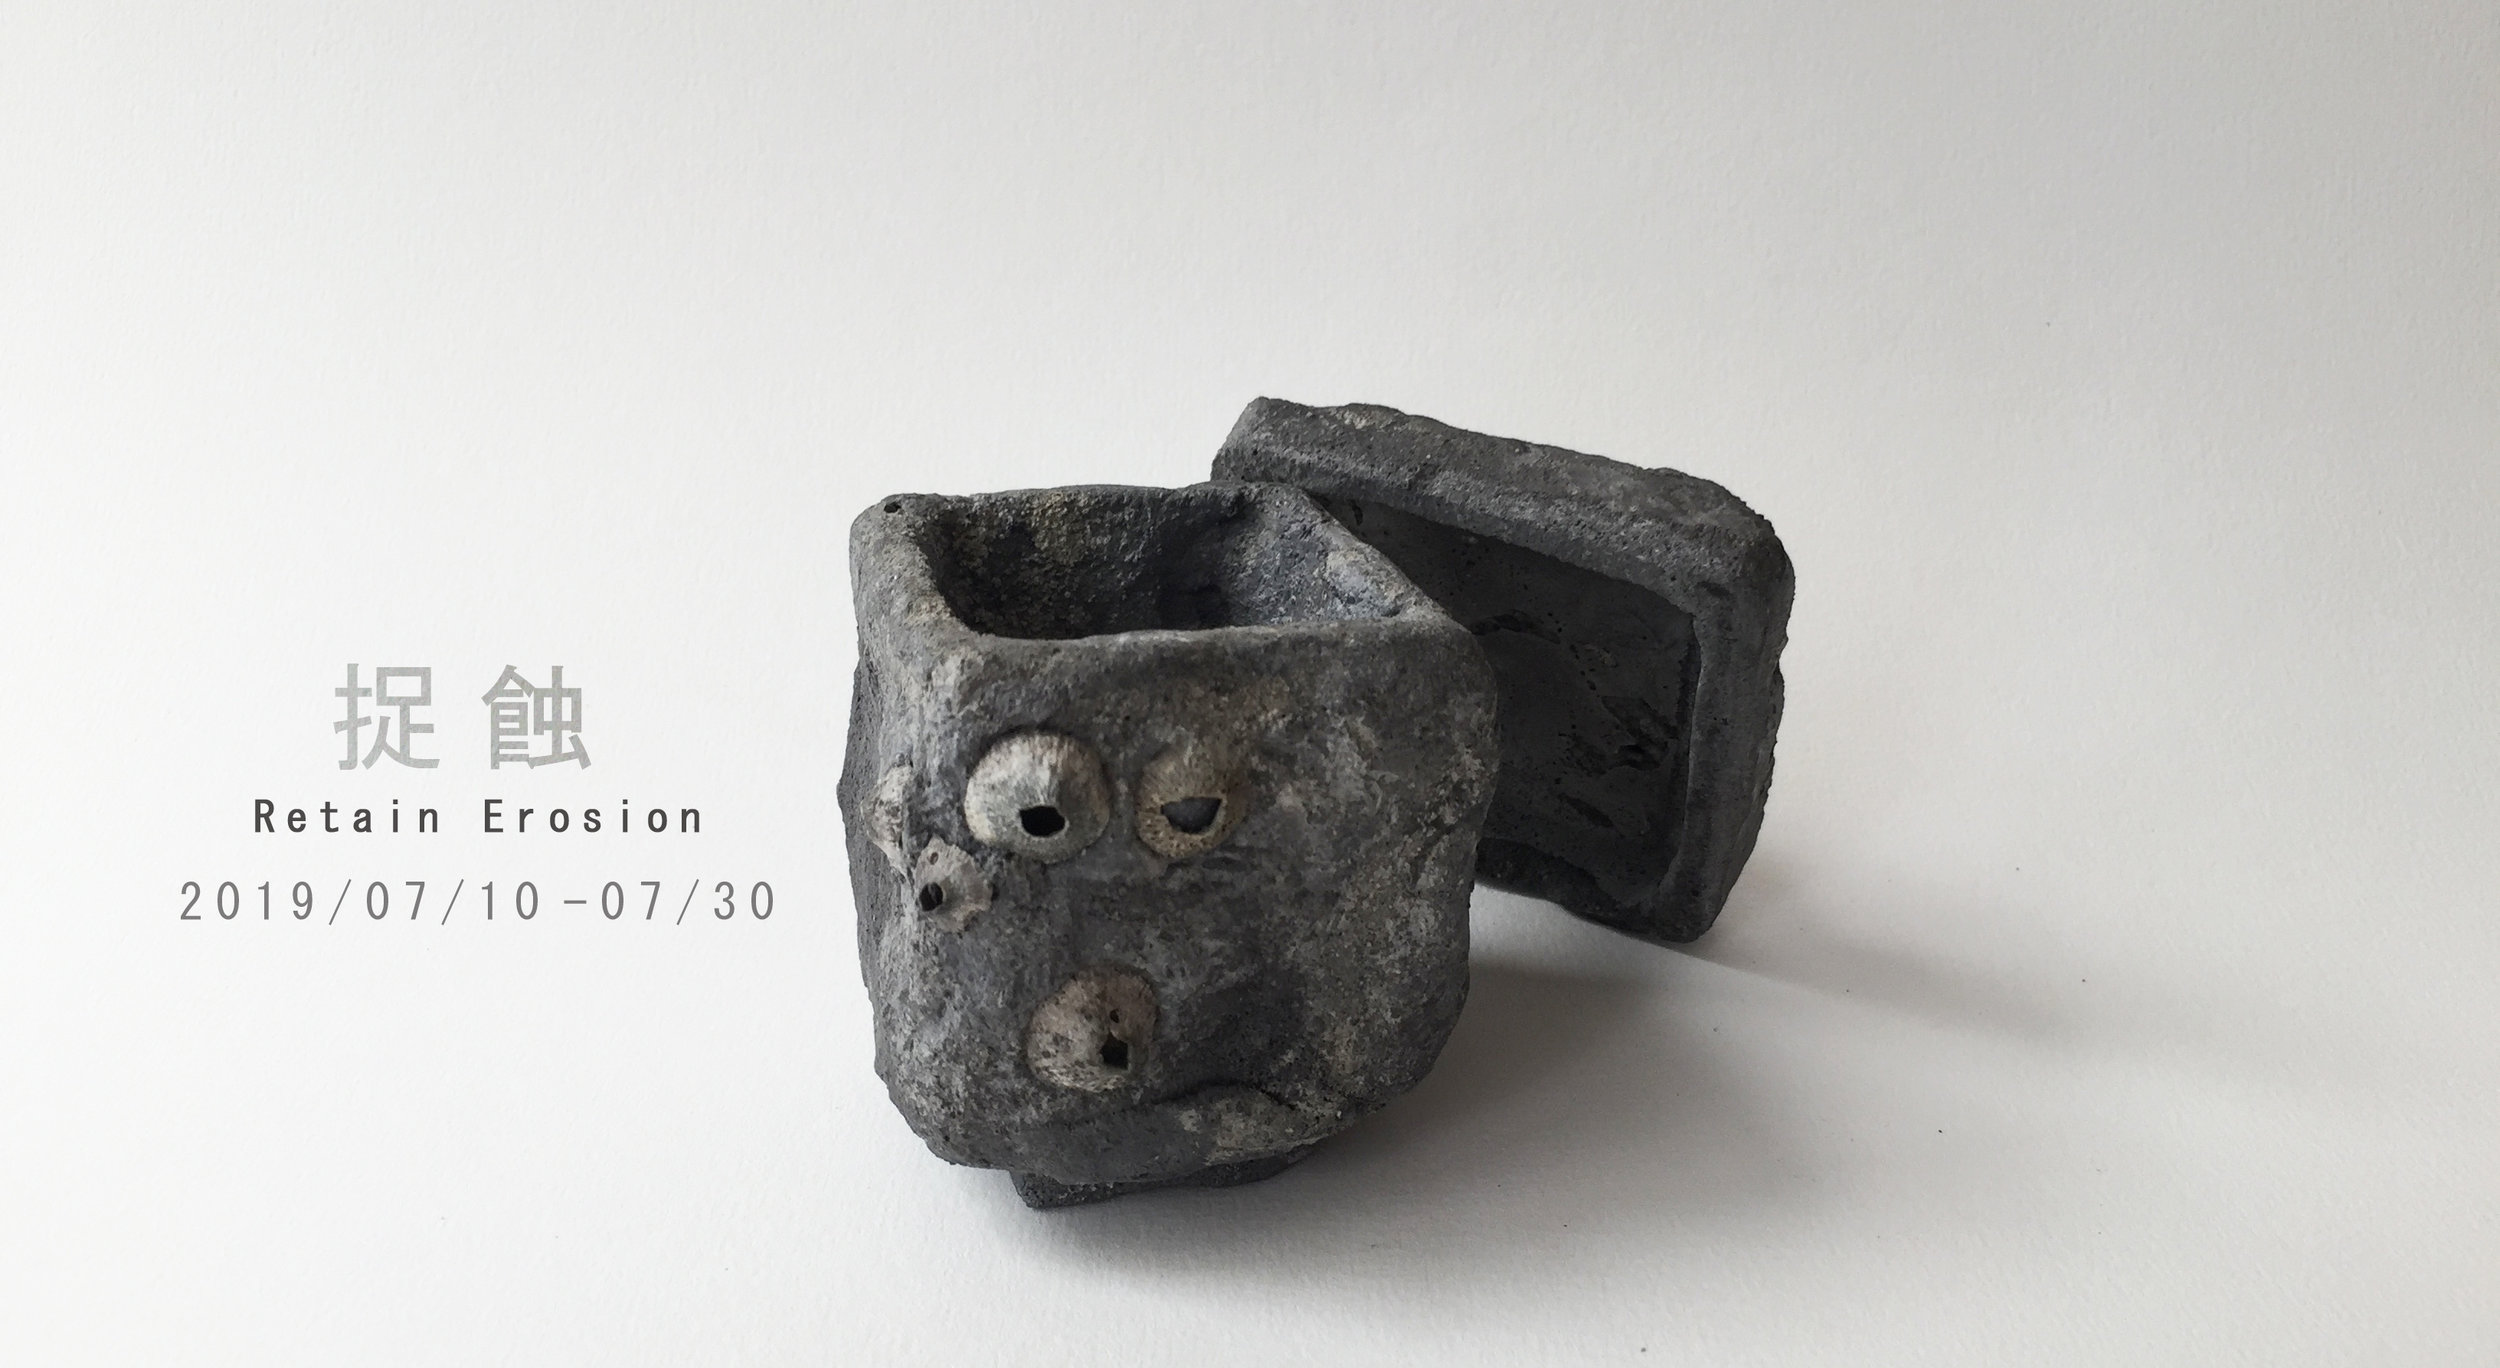 捉蝕 Retain Erosion|張育臺 個展 -